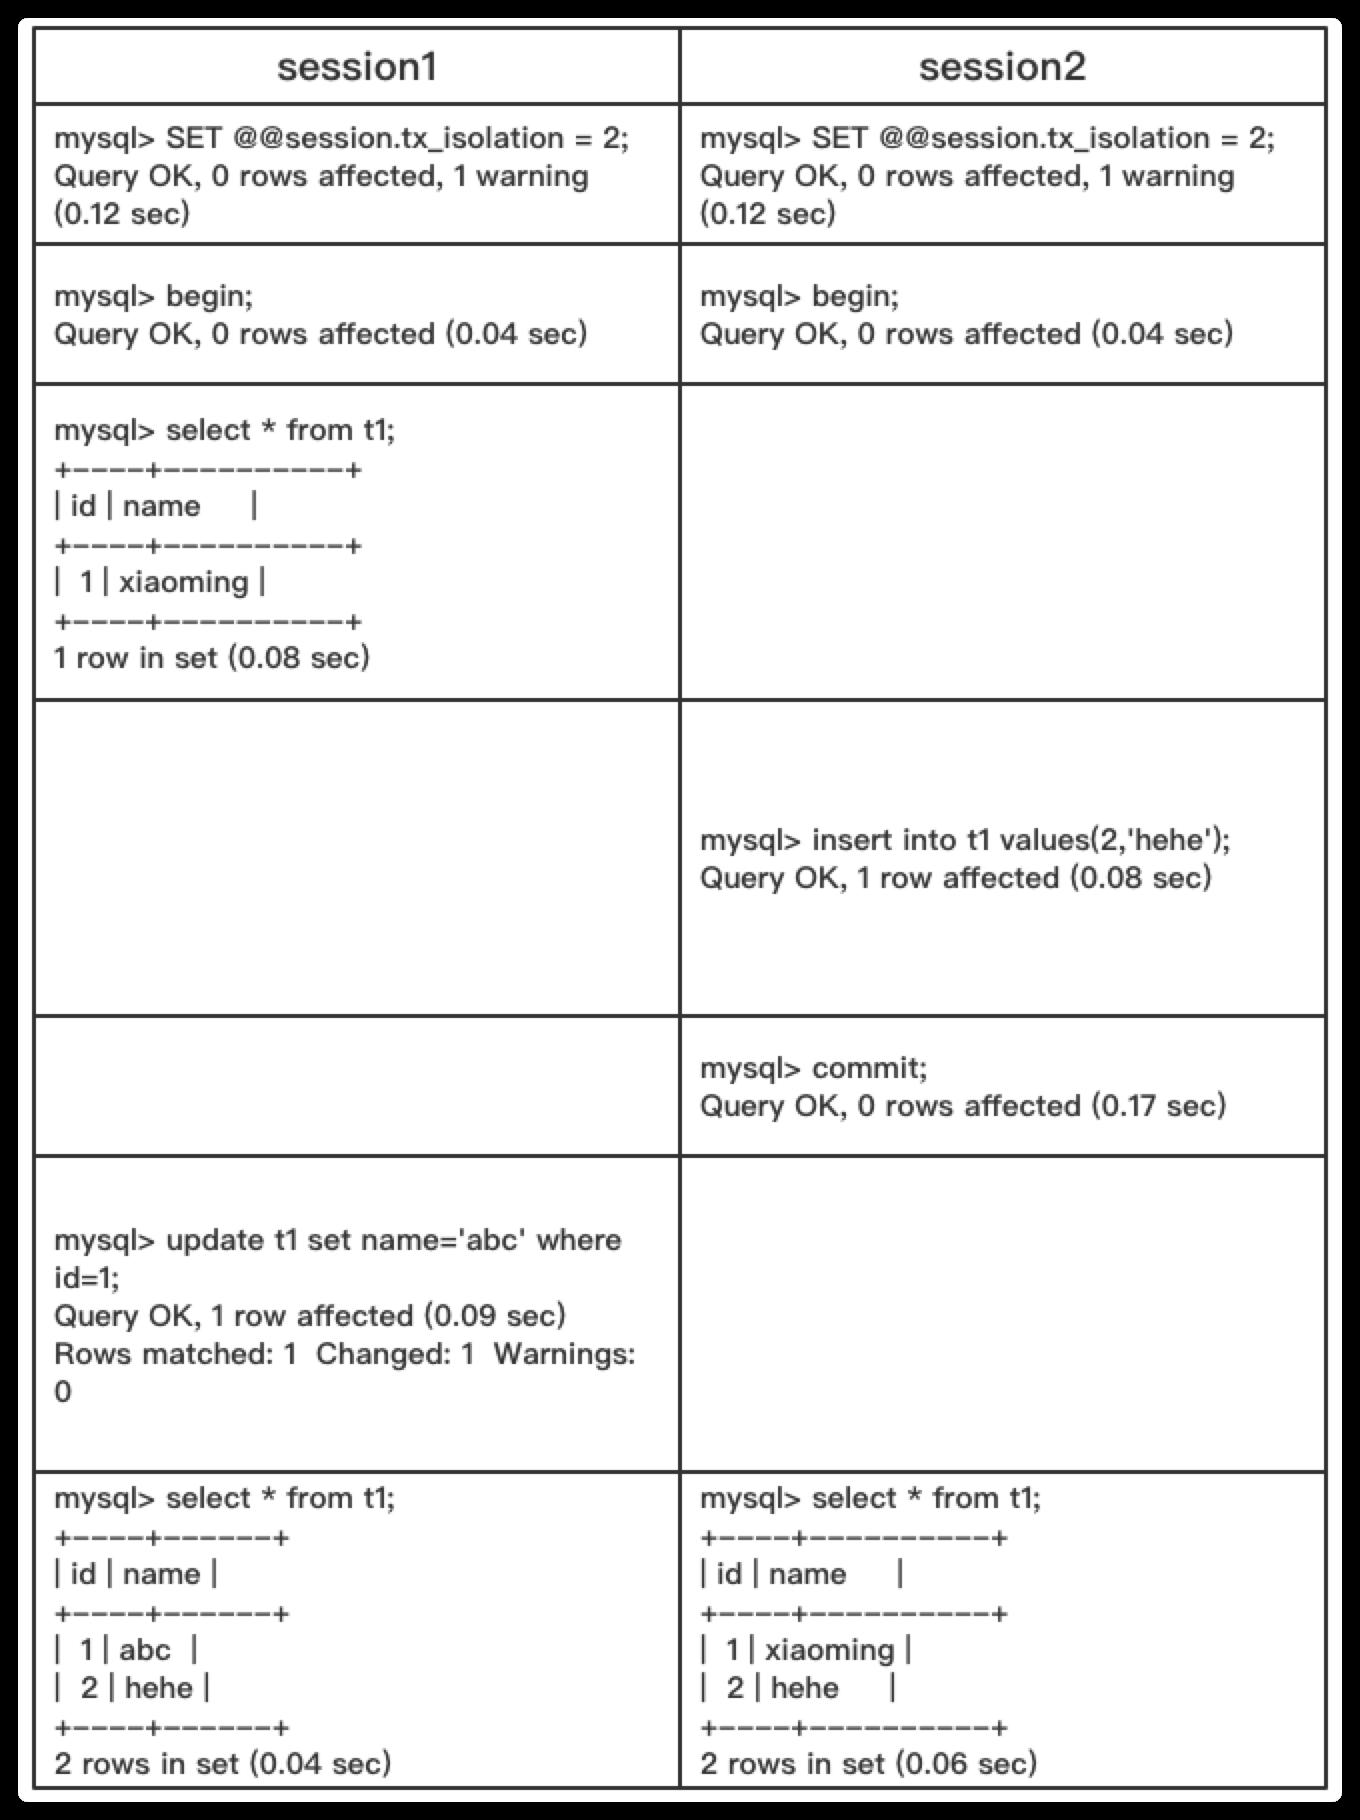 iShot2020-05-0813.12.21